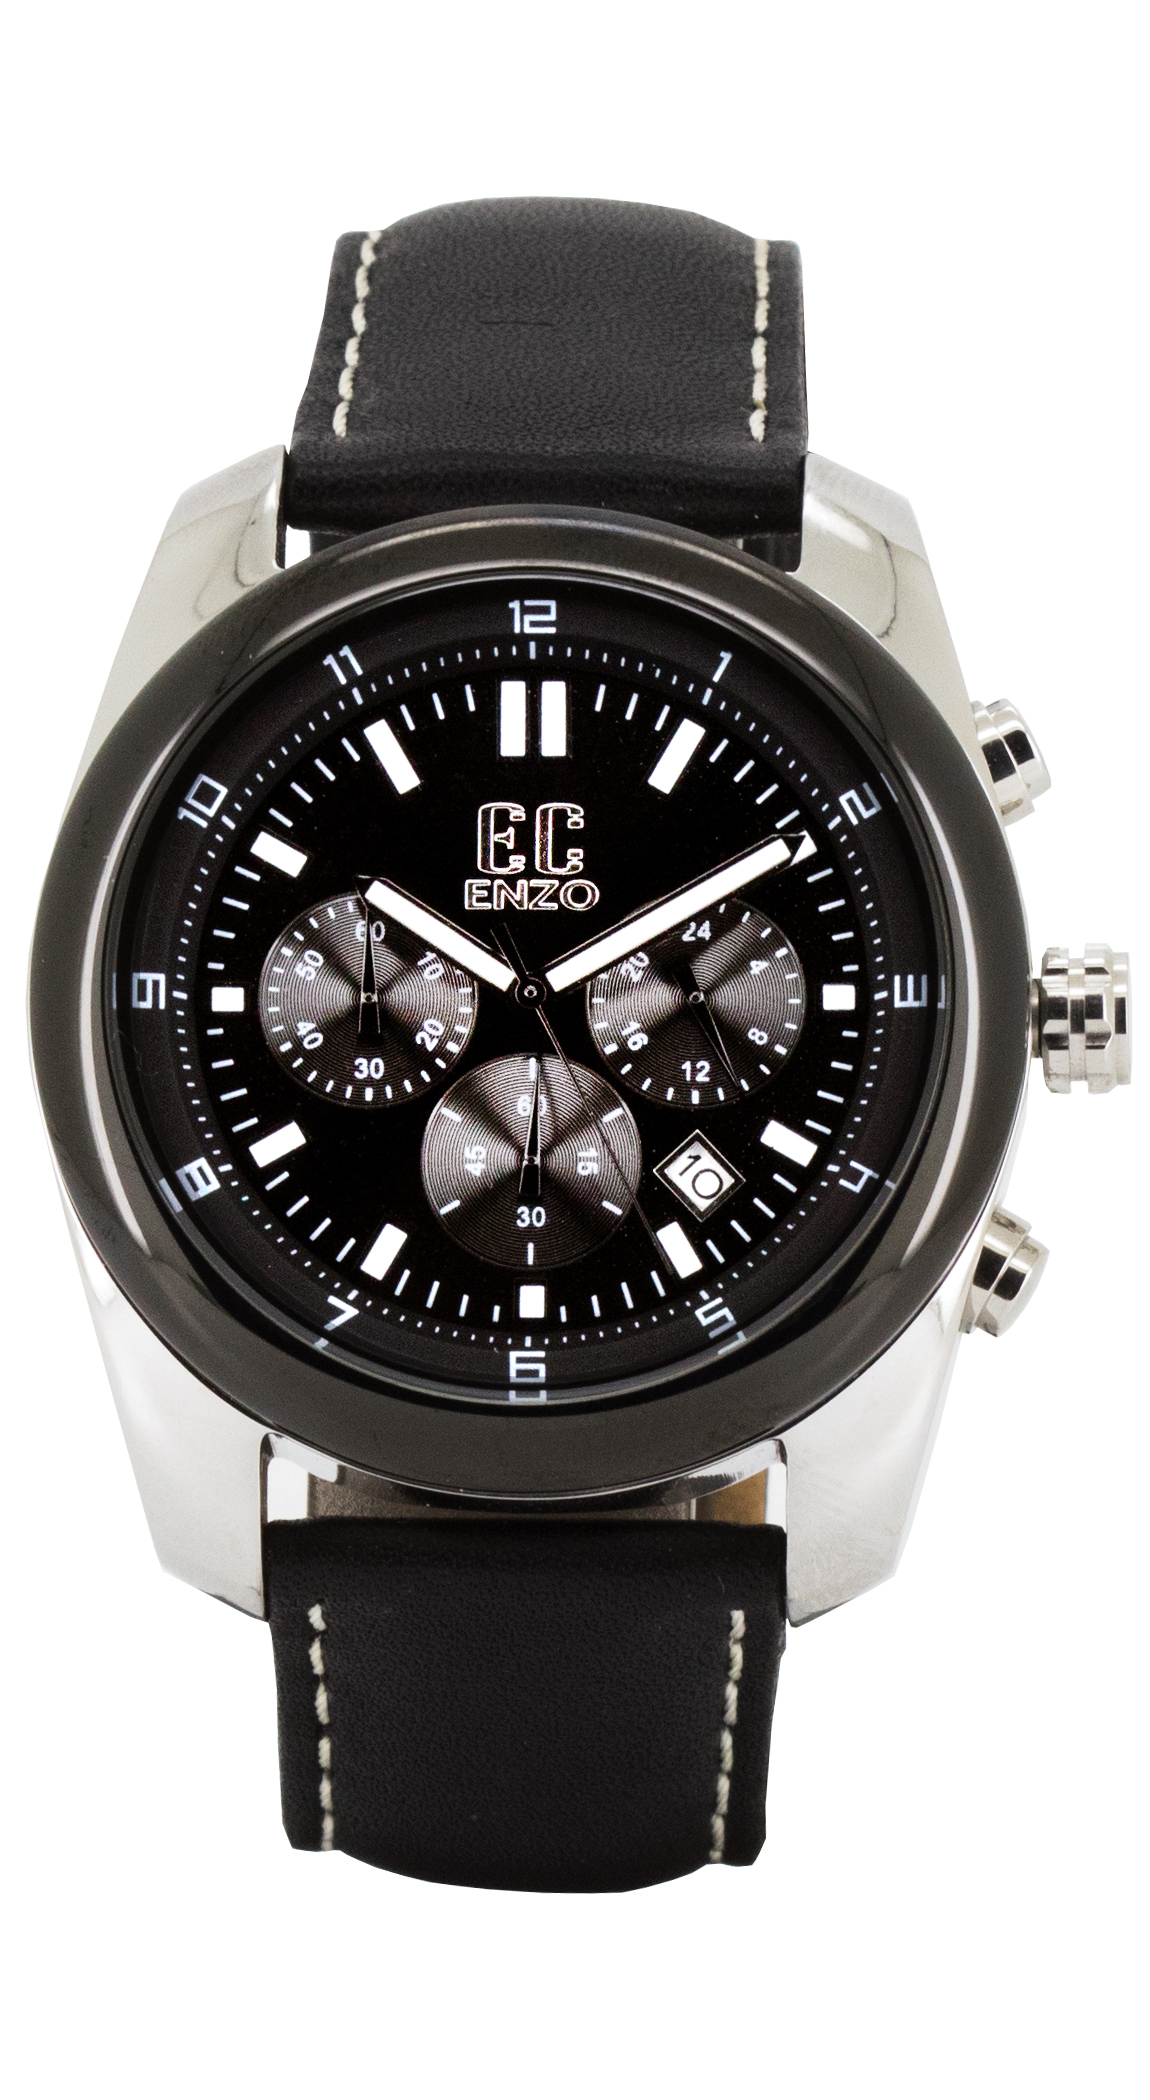 EC#0248# – Enzo Collection